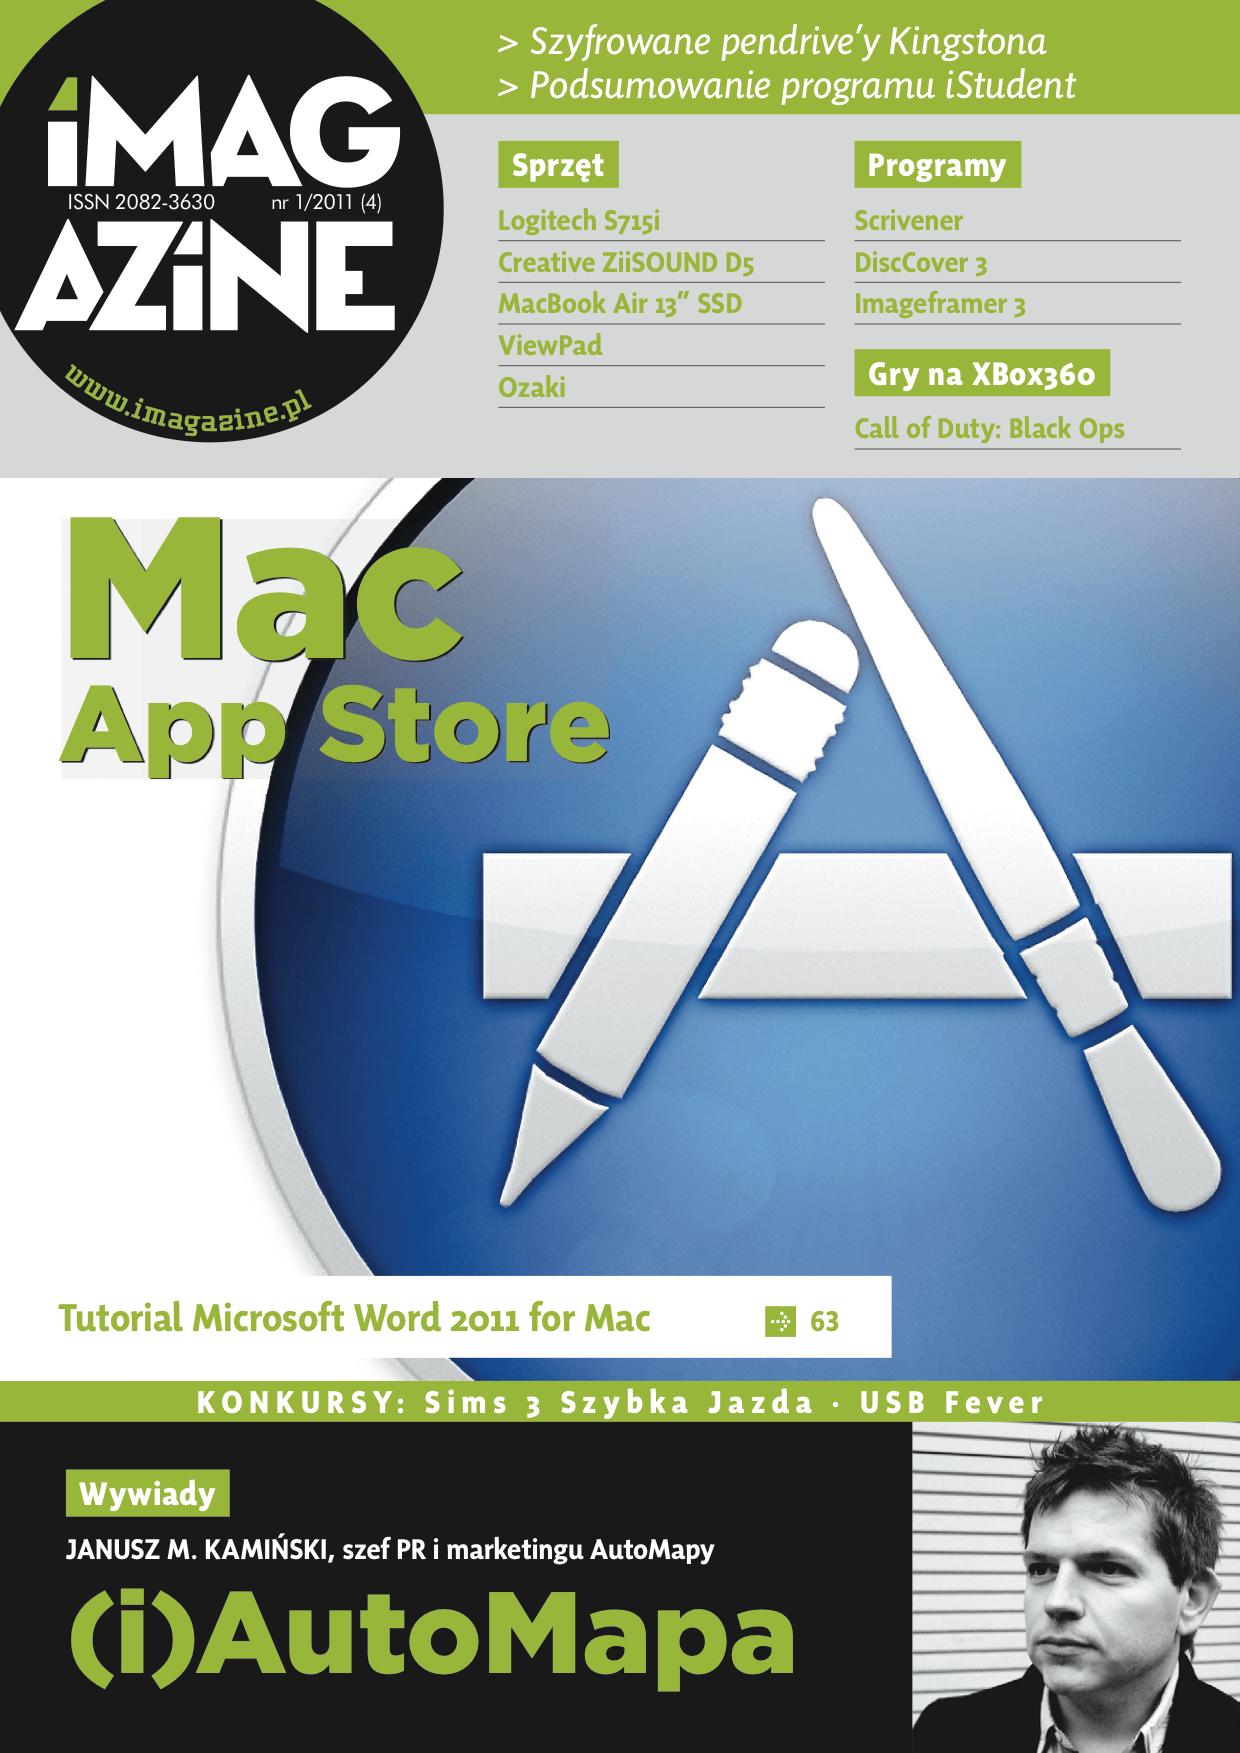 iMagazine 1/2011 – Mac App Store, Automapa